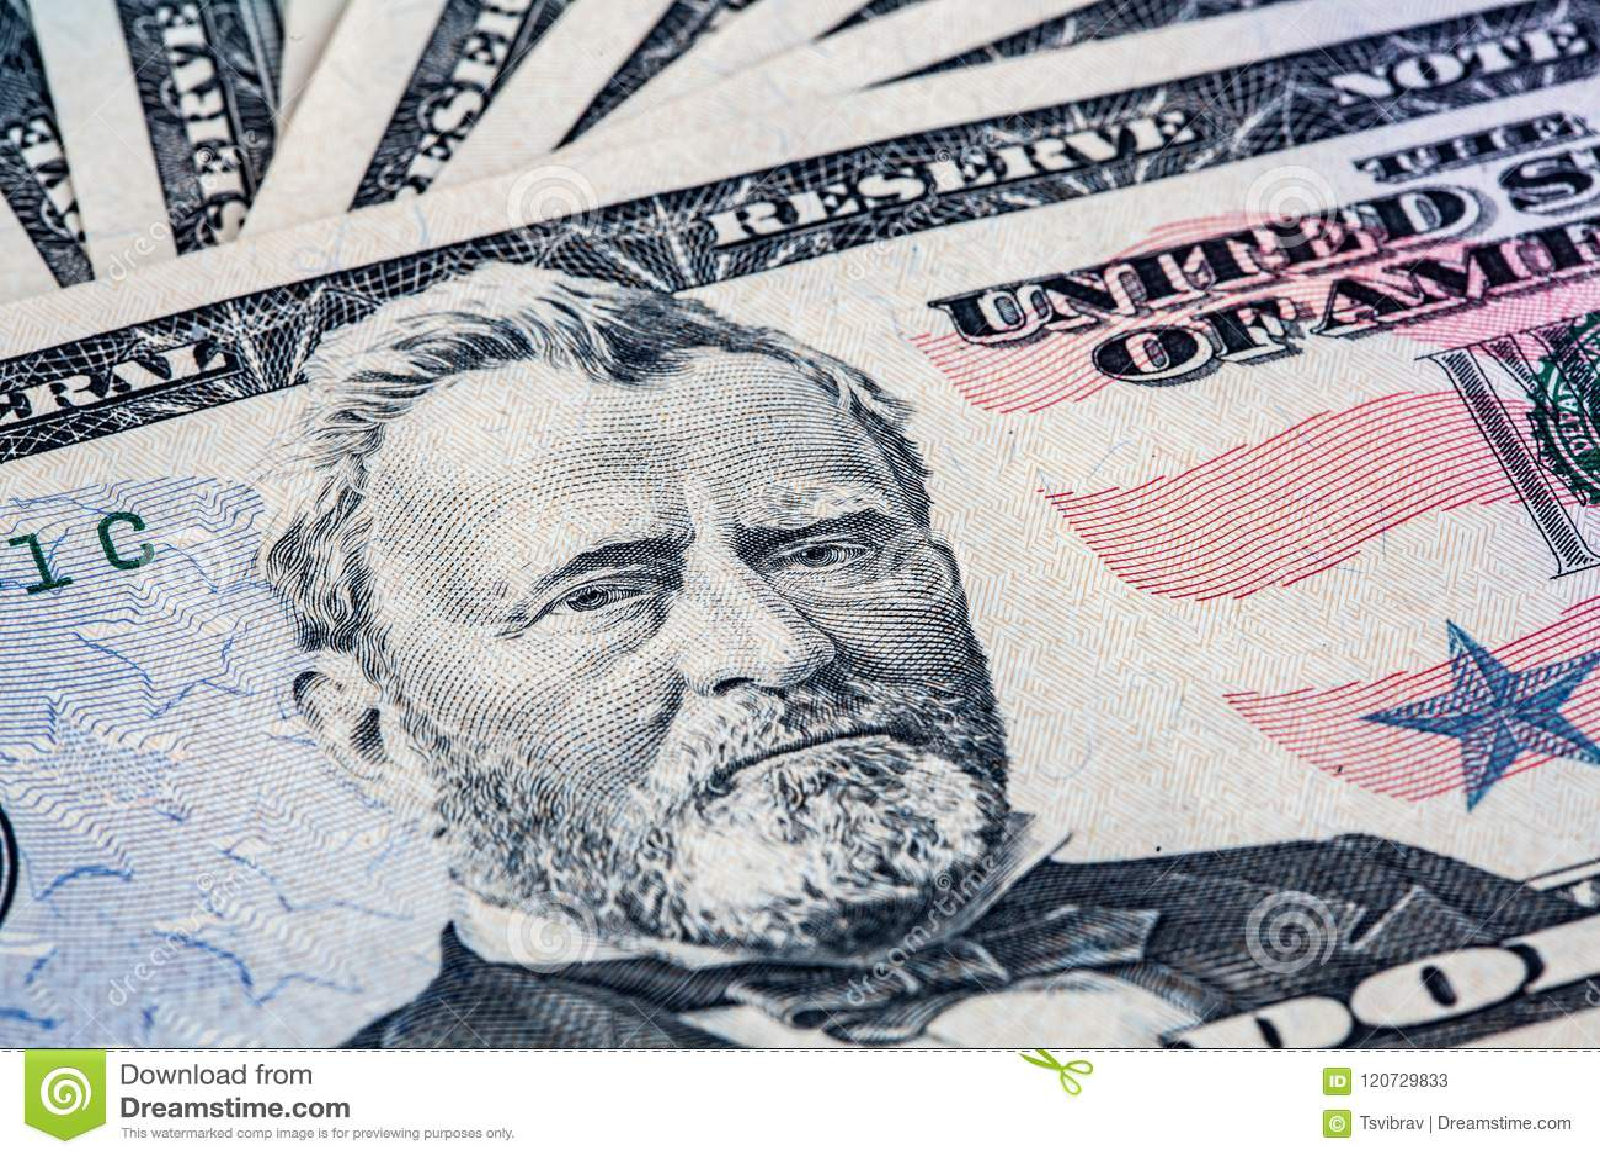 50 dollar bill with Ulysses S. Grant portrait.